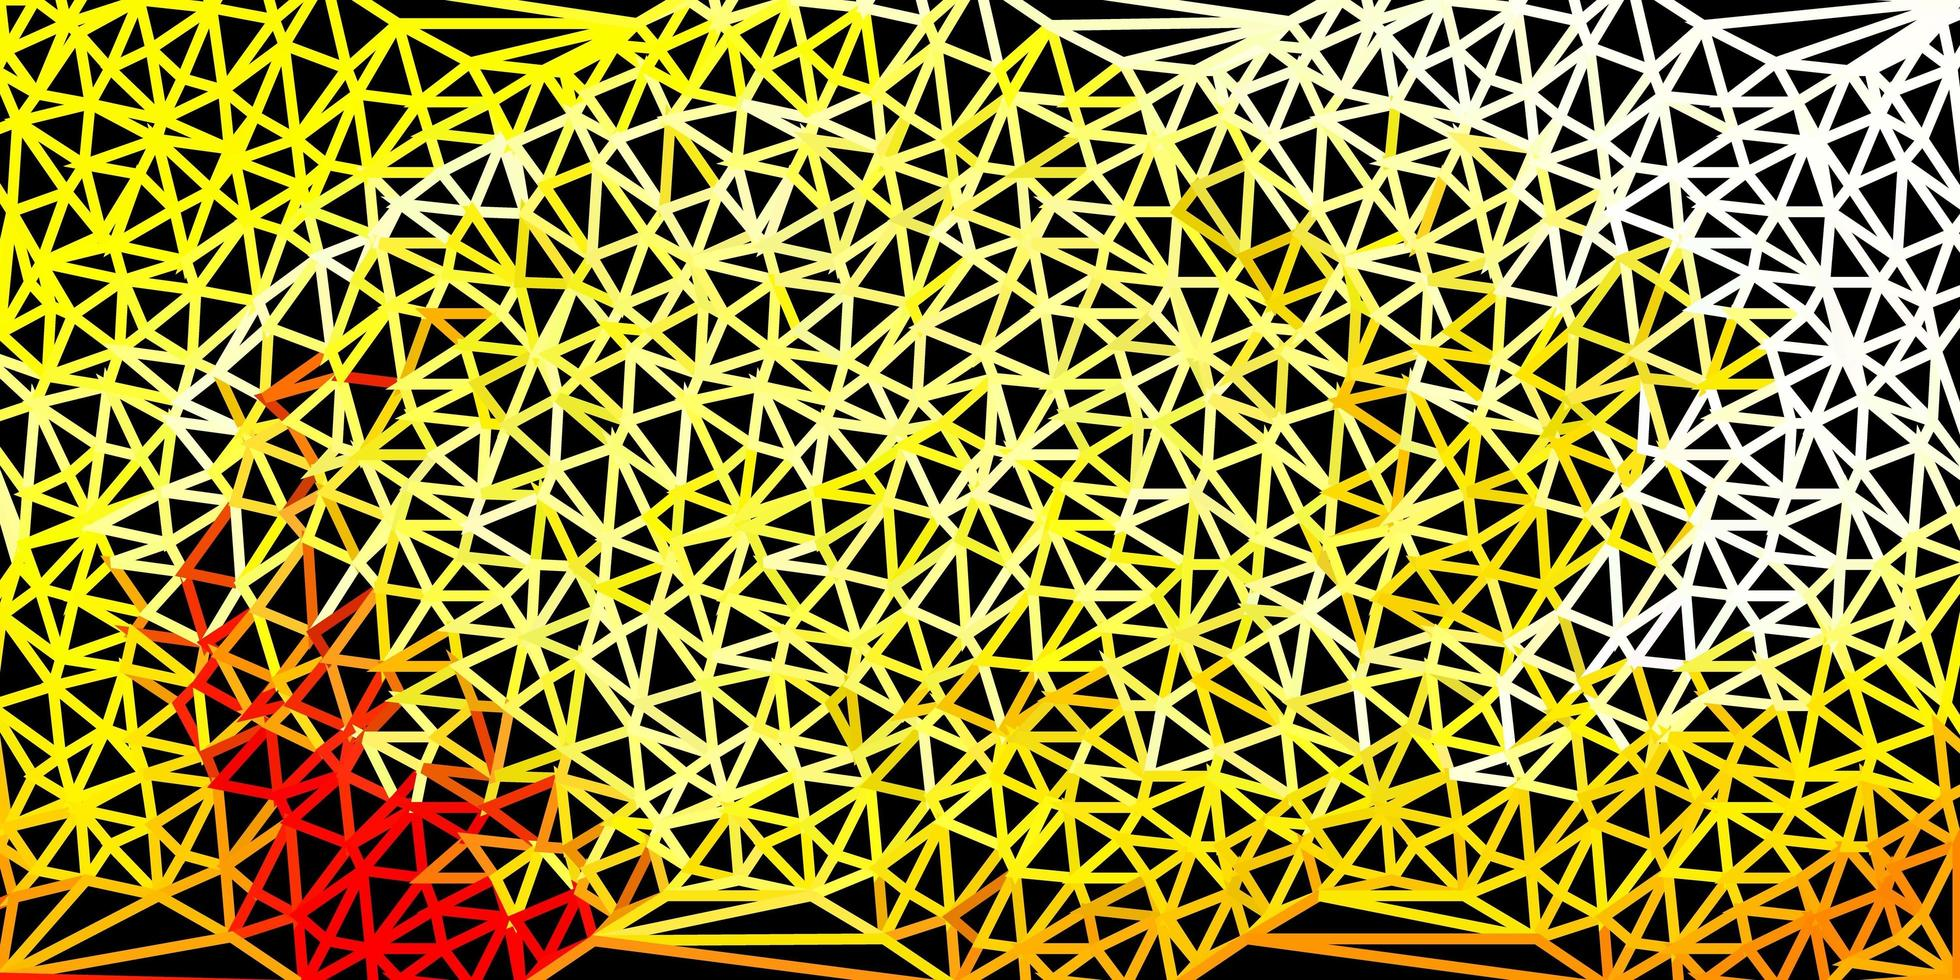 ljusröd, gul vektor triangel mosaik bakgrund.